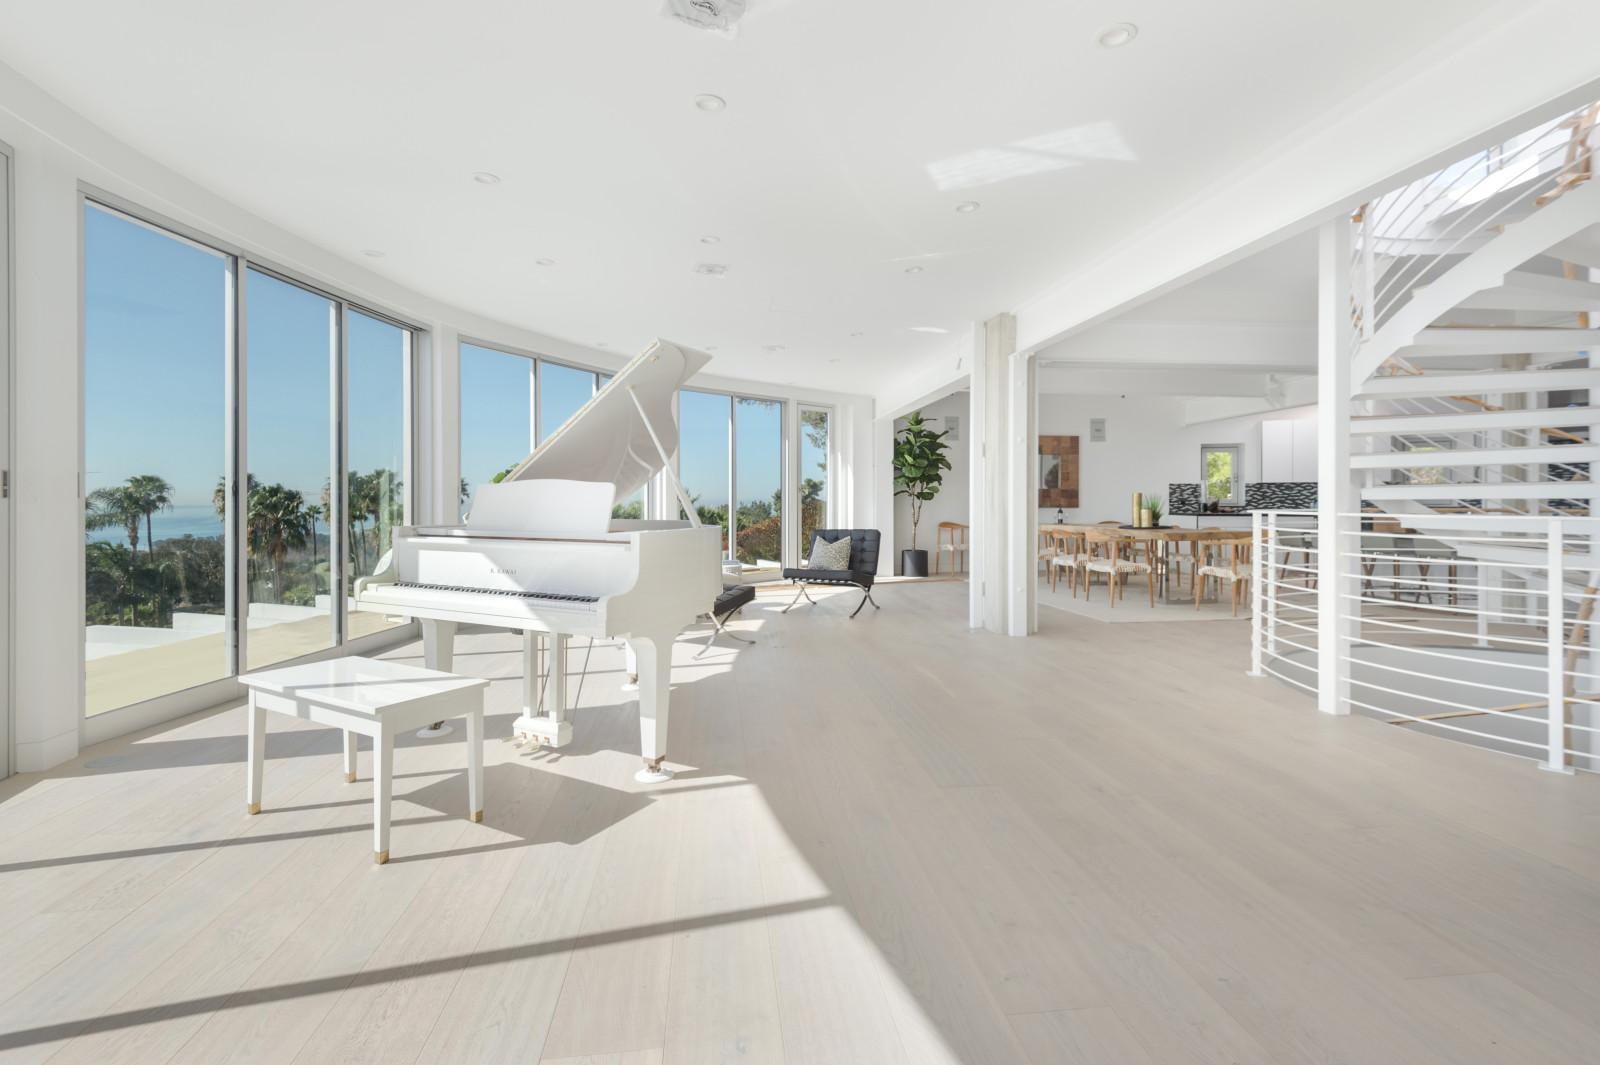 002 Living Room Piano 6375 Gayton Place Malibu For Sale Lease The Malibu Life Team Luxury Real Estate